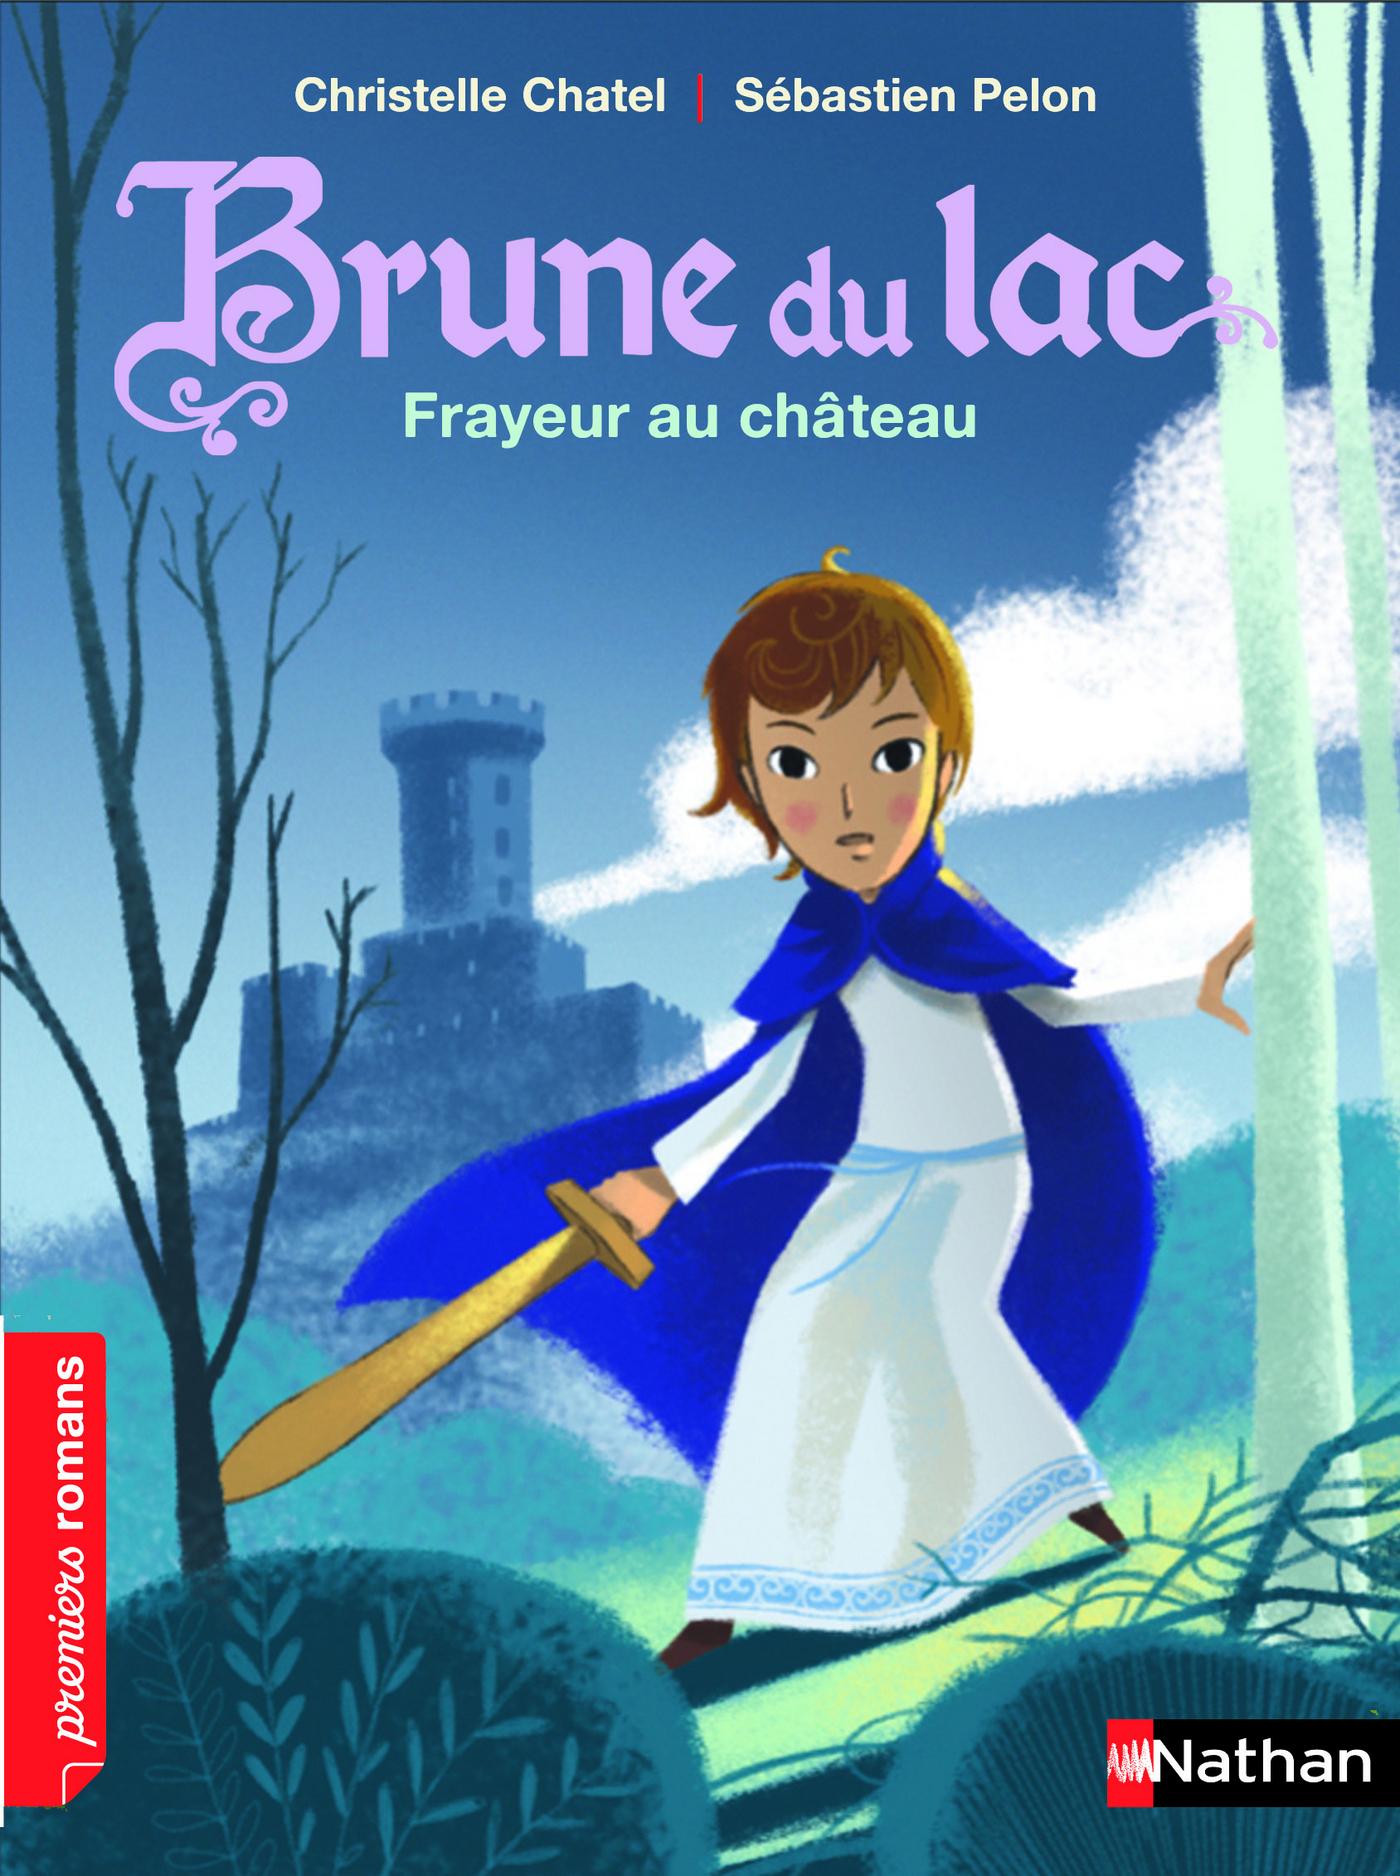 Frayeur au château | Pelon, Sébastien